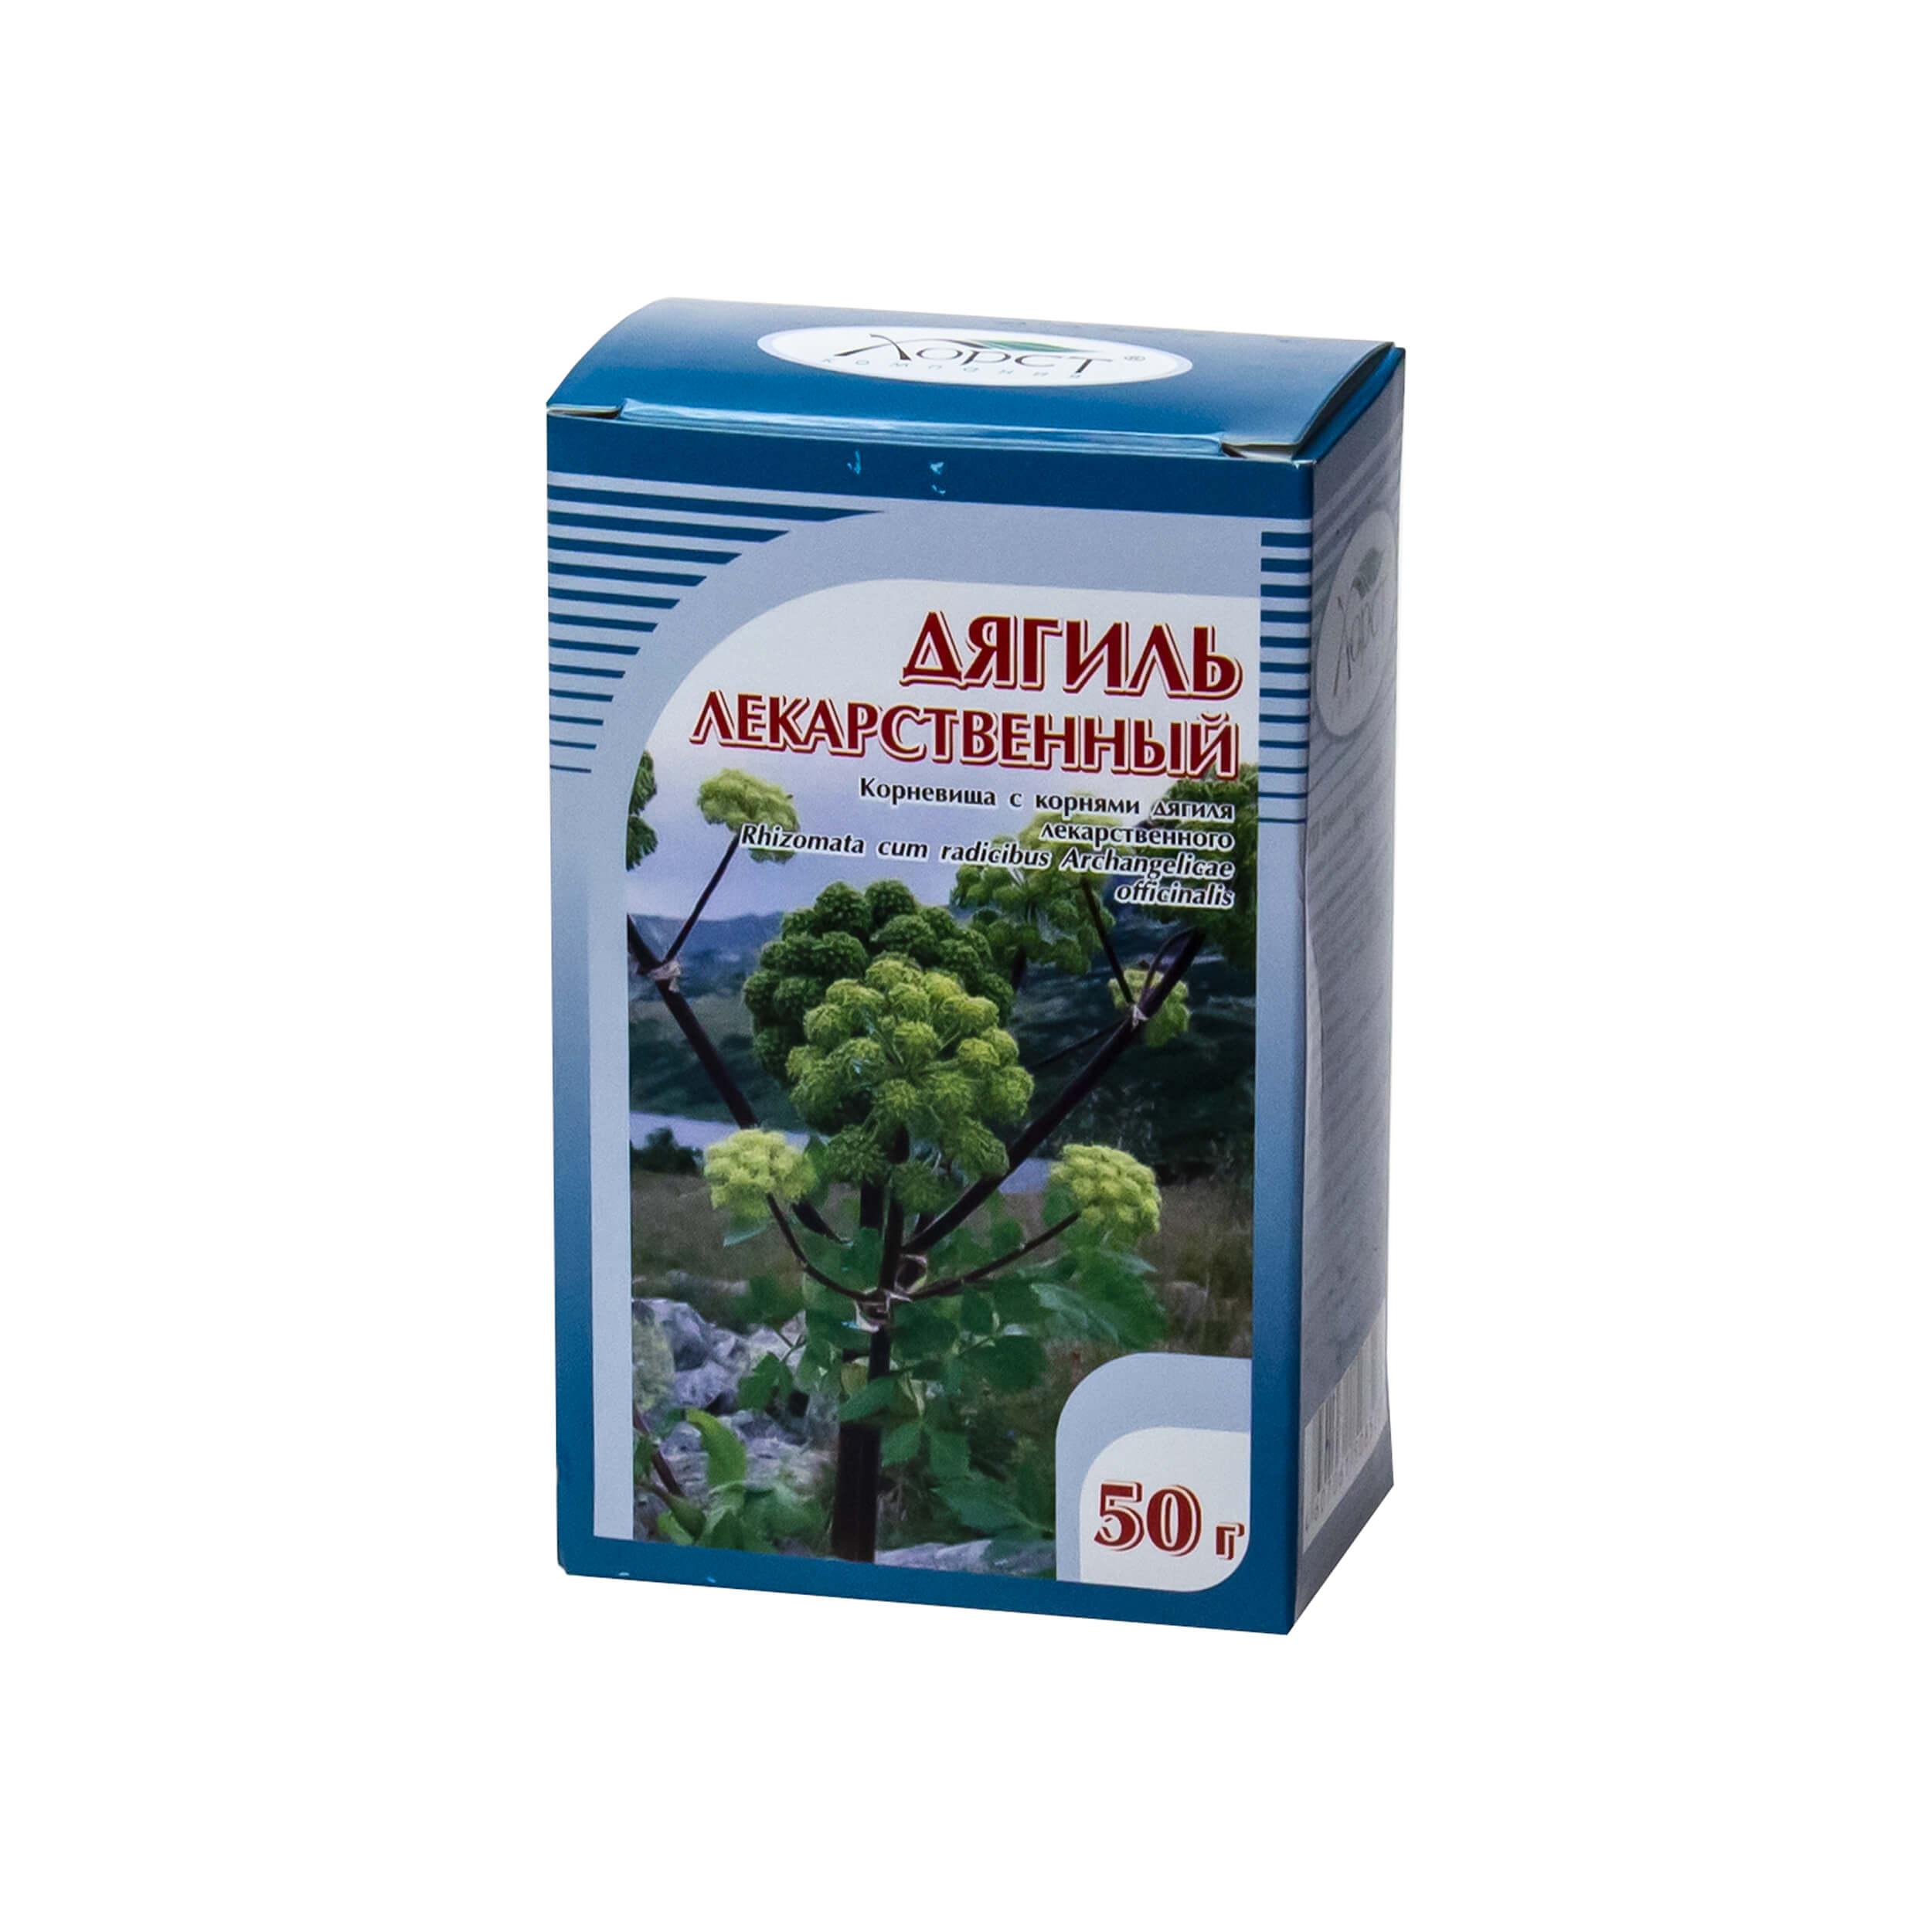 Дягиль лекарственный (корневища с корнями, 50 грамм) фото